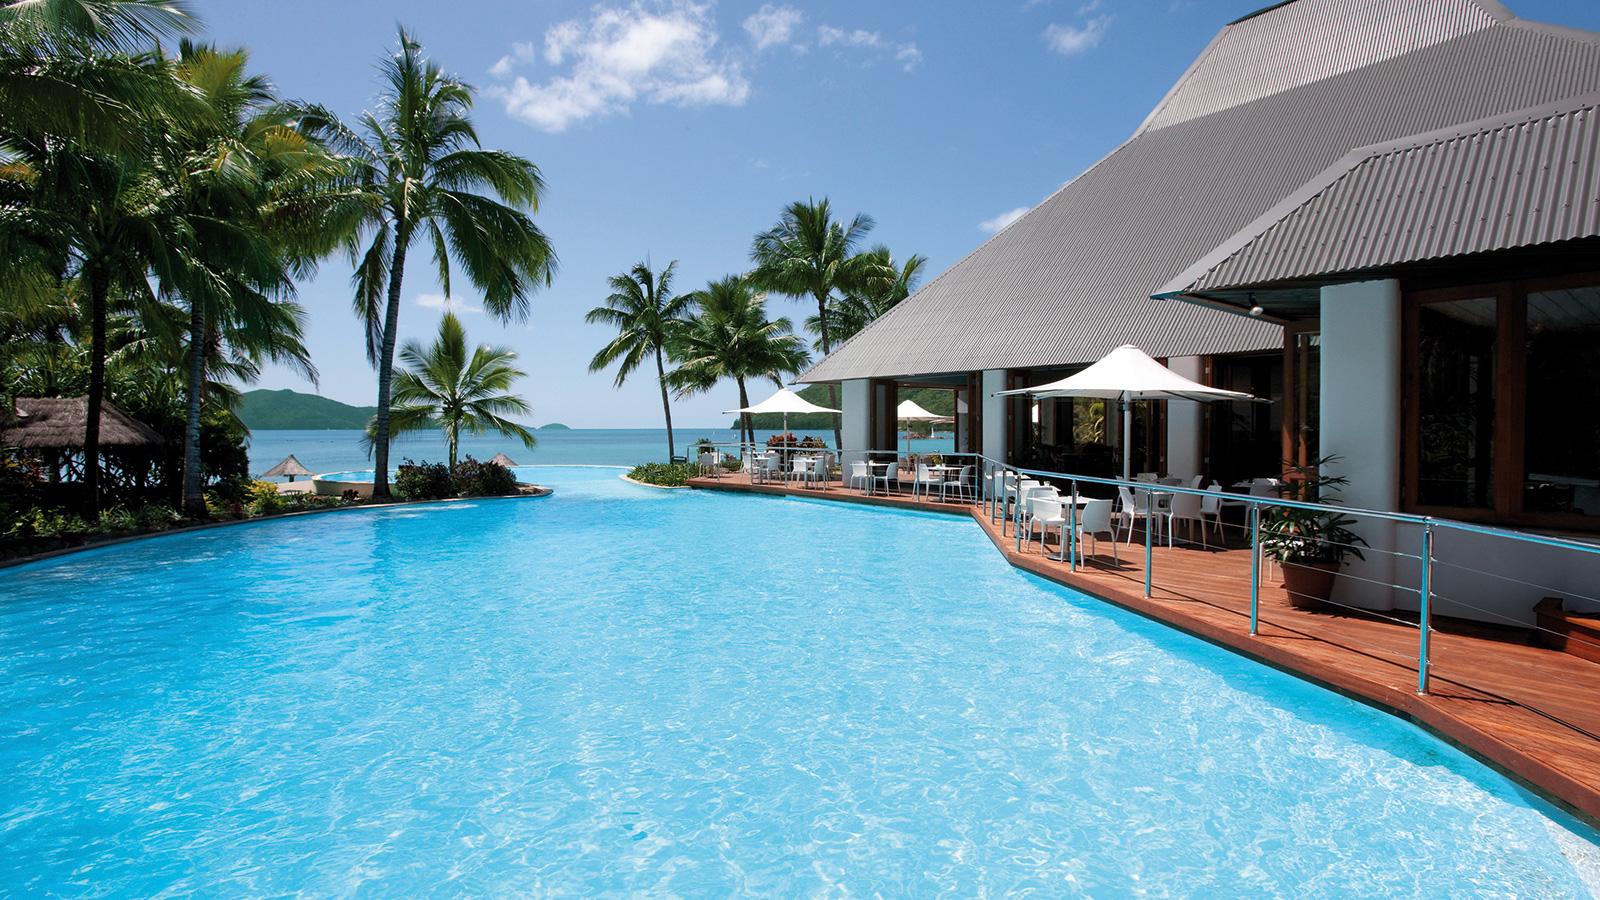 Sails Restaurant Dolphin Pool